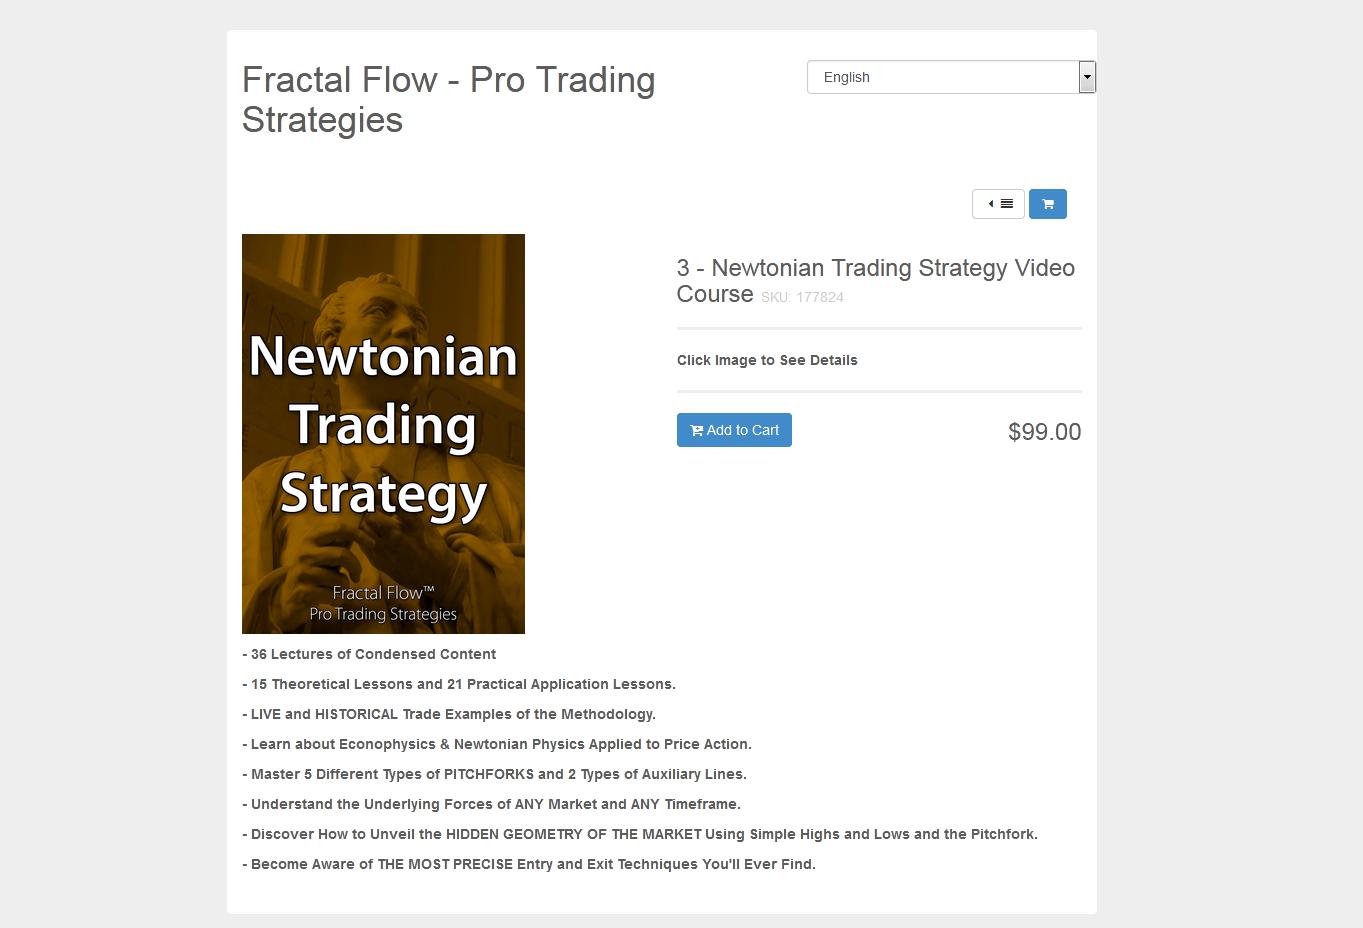 Fractal Flow - Pro Trading Strategies